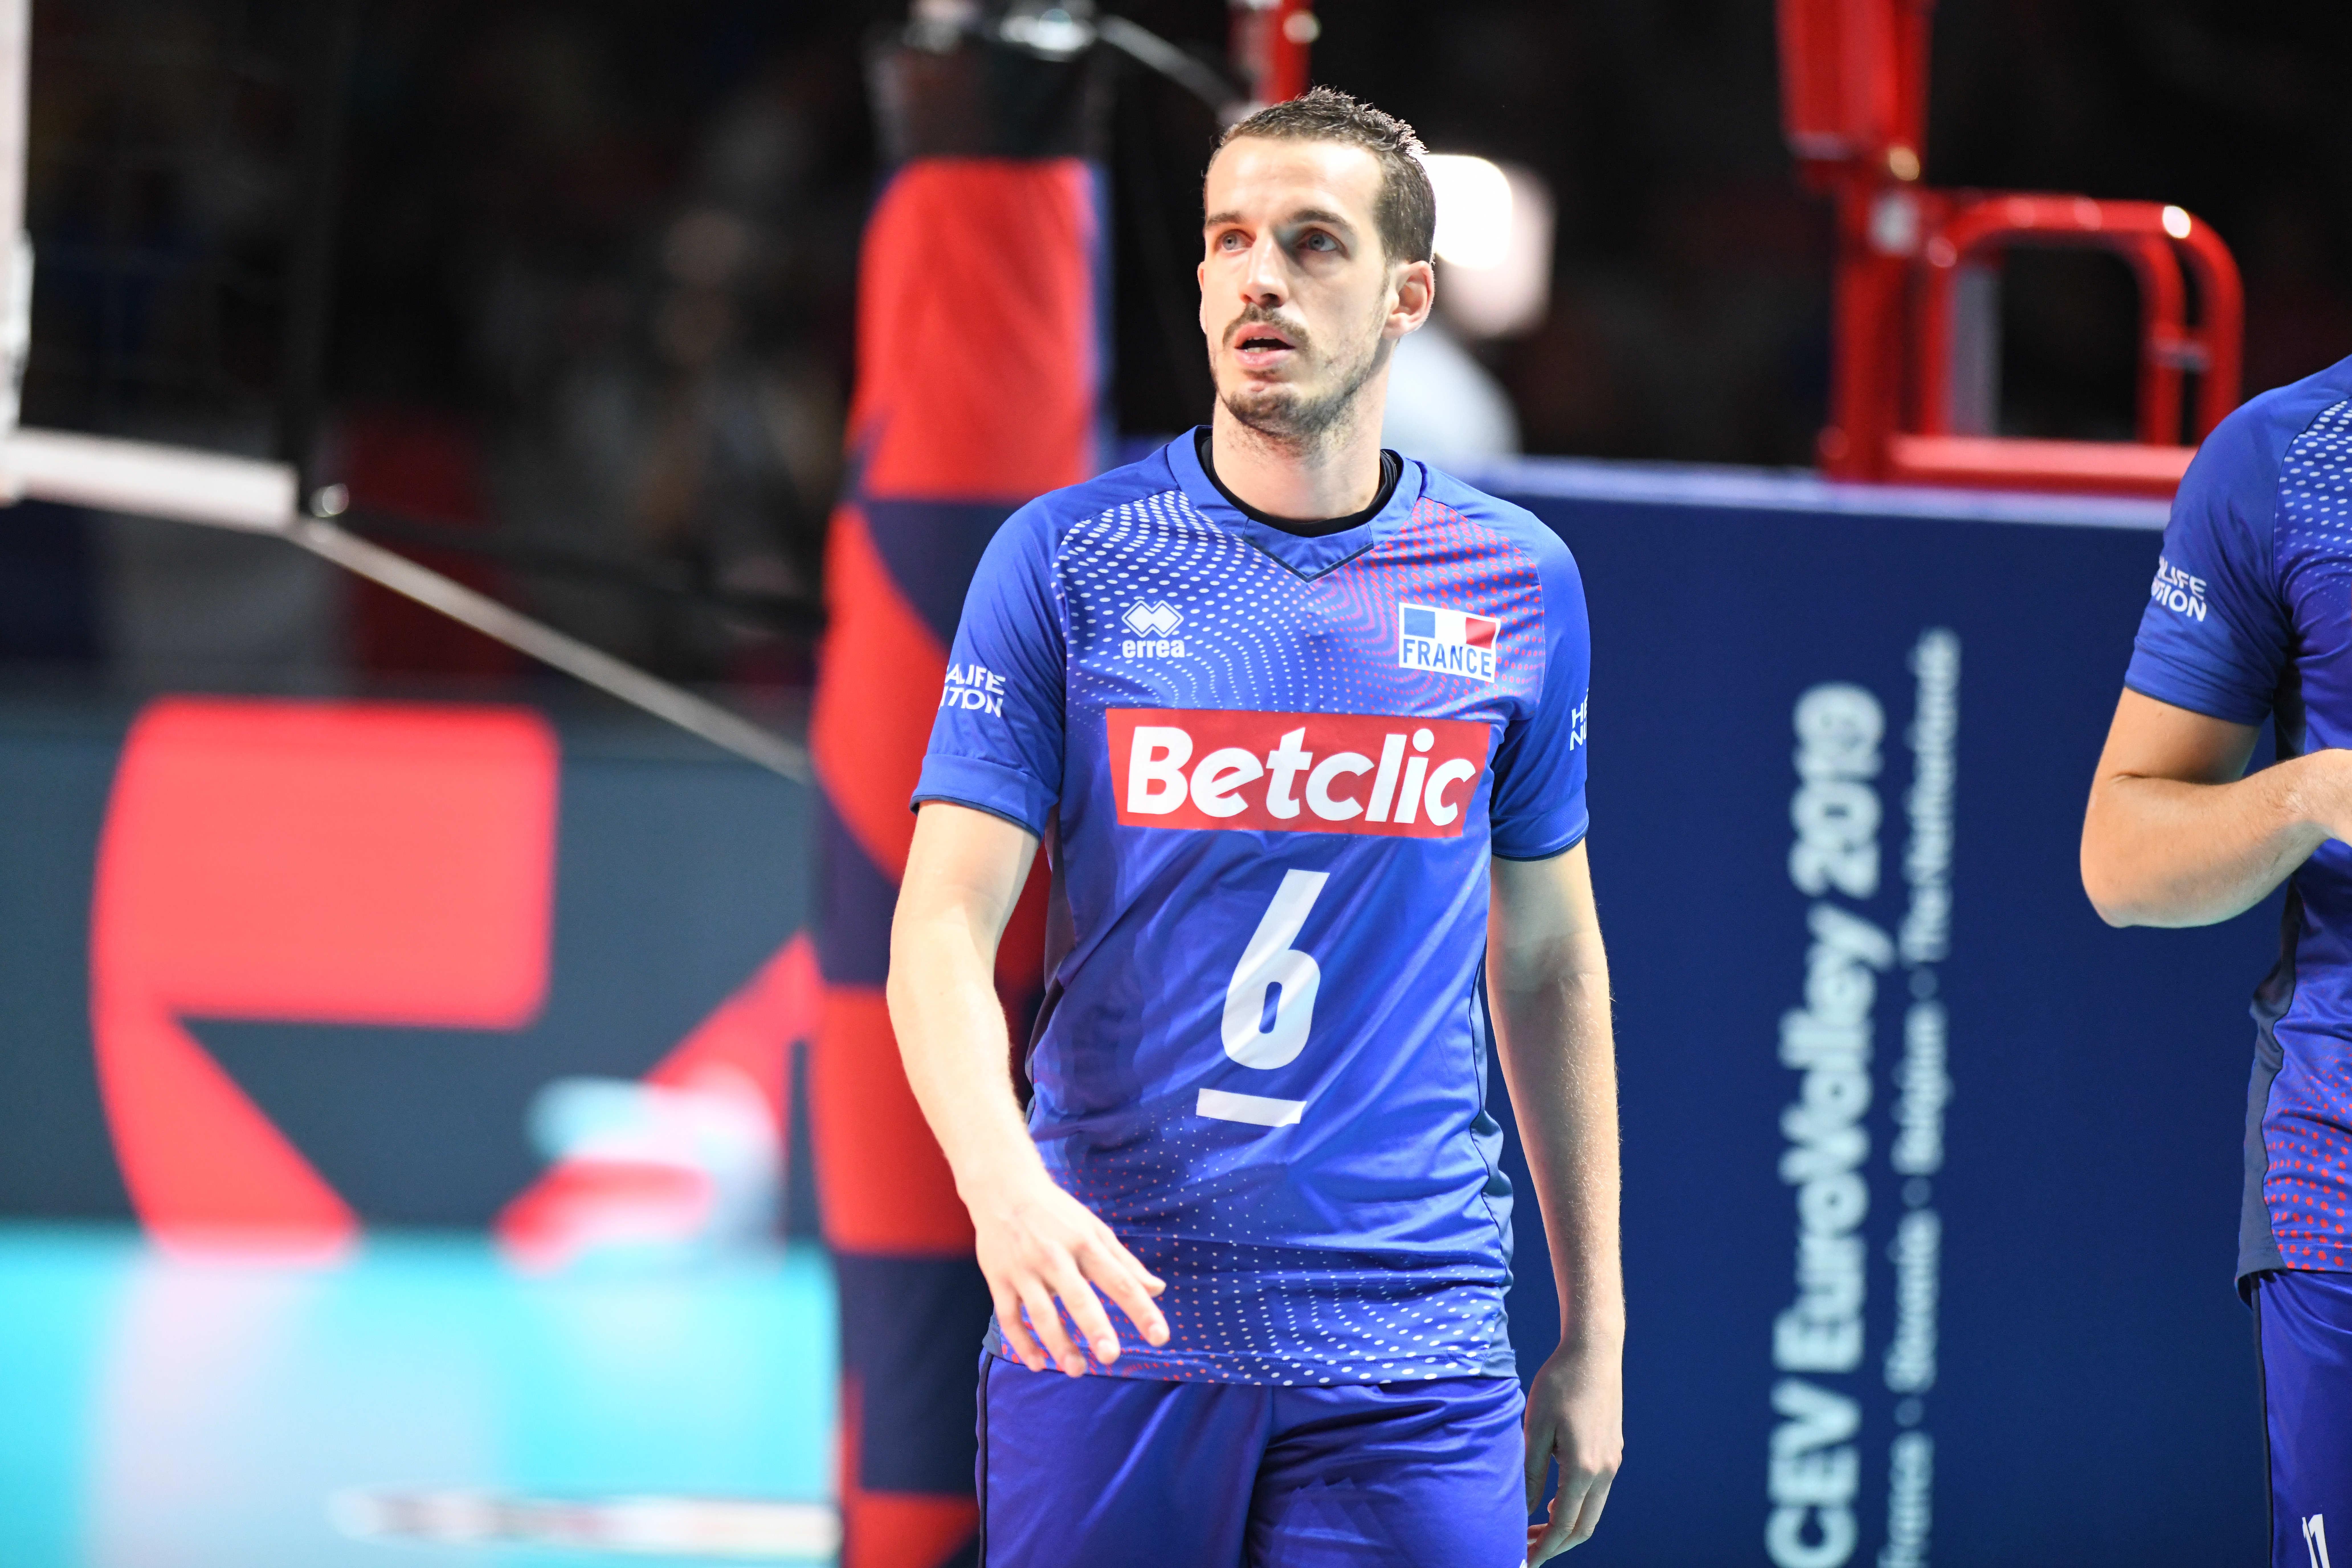 Volley - Equipe de France - «Compliqué» d'aller chercher la qualification olympique, estime Benjamin Toniutti